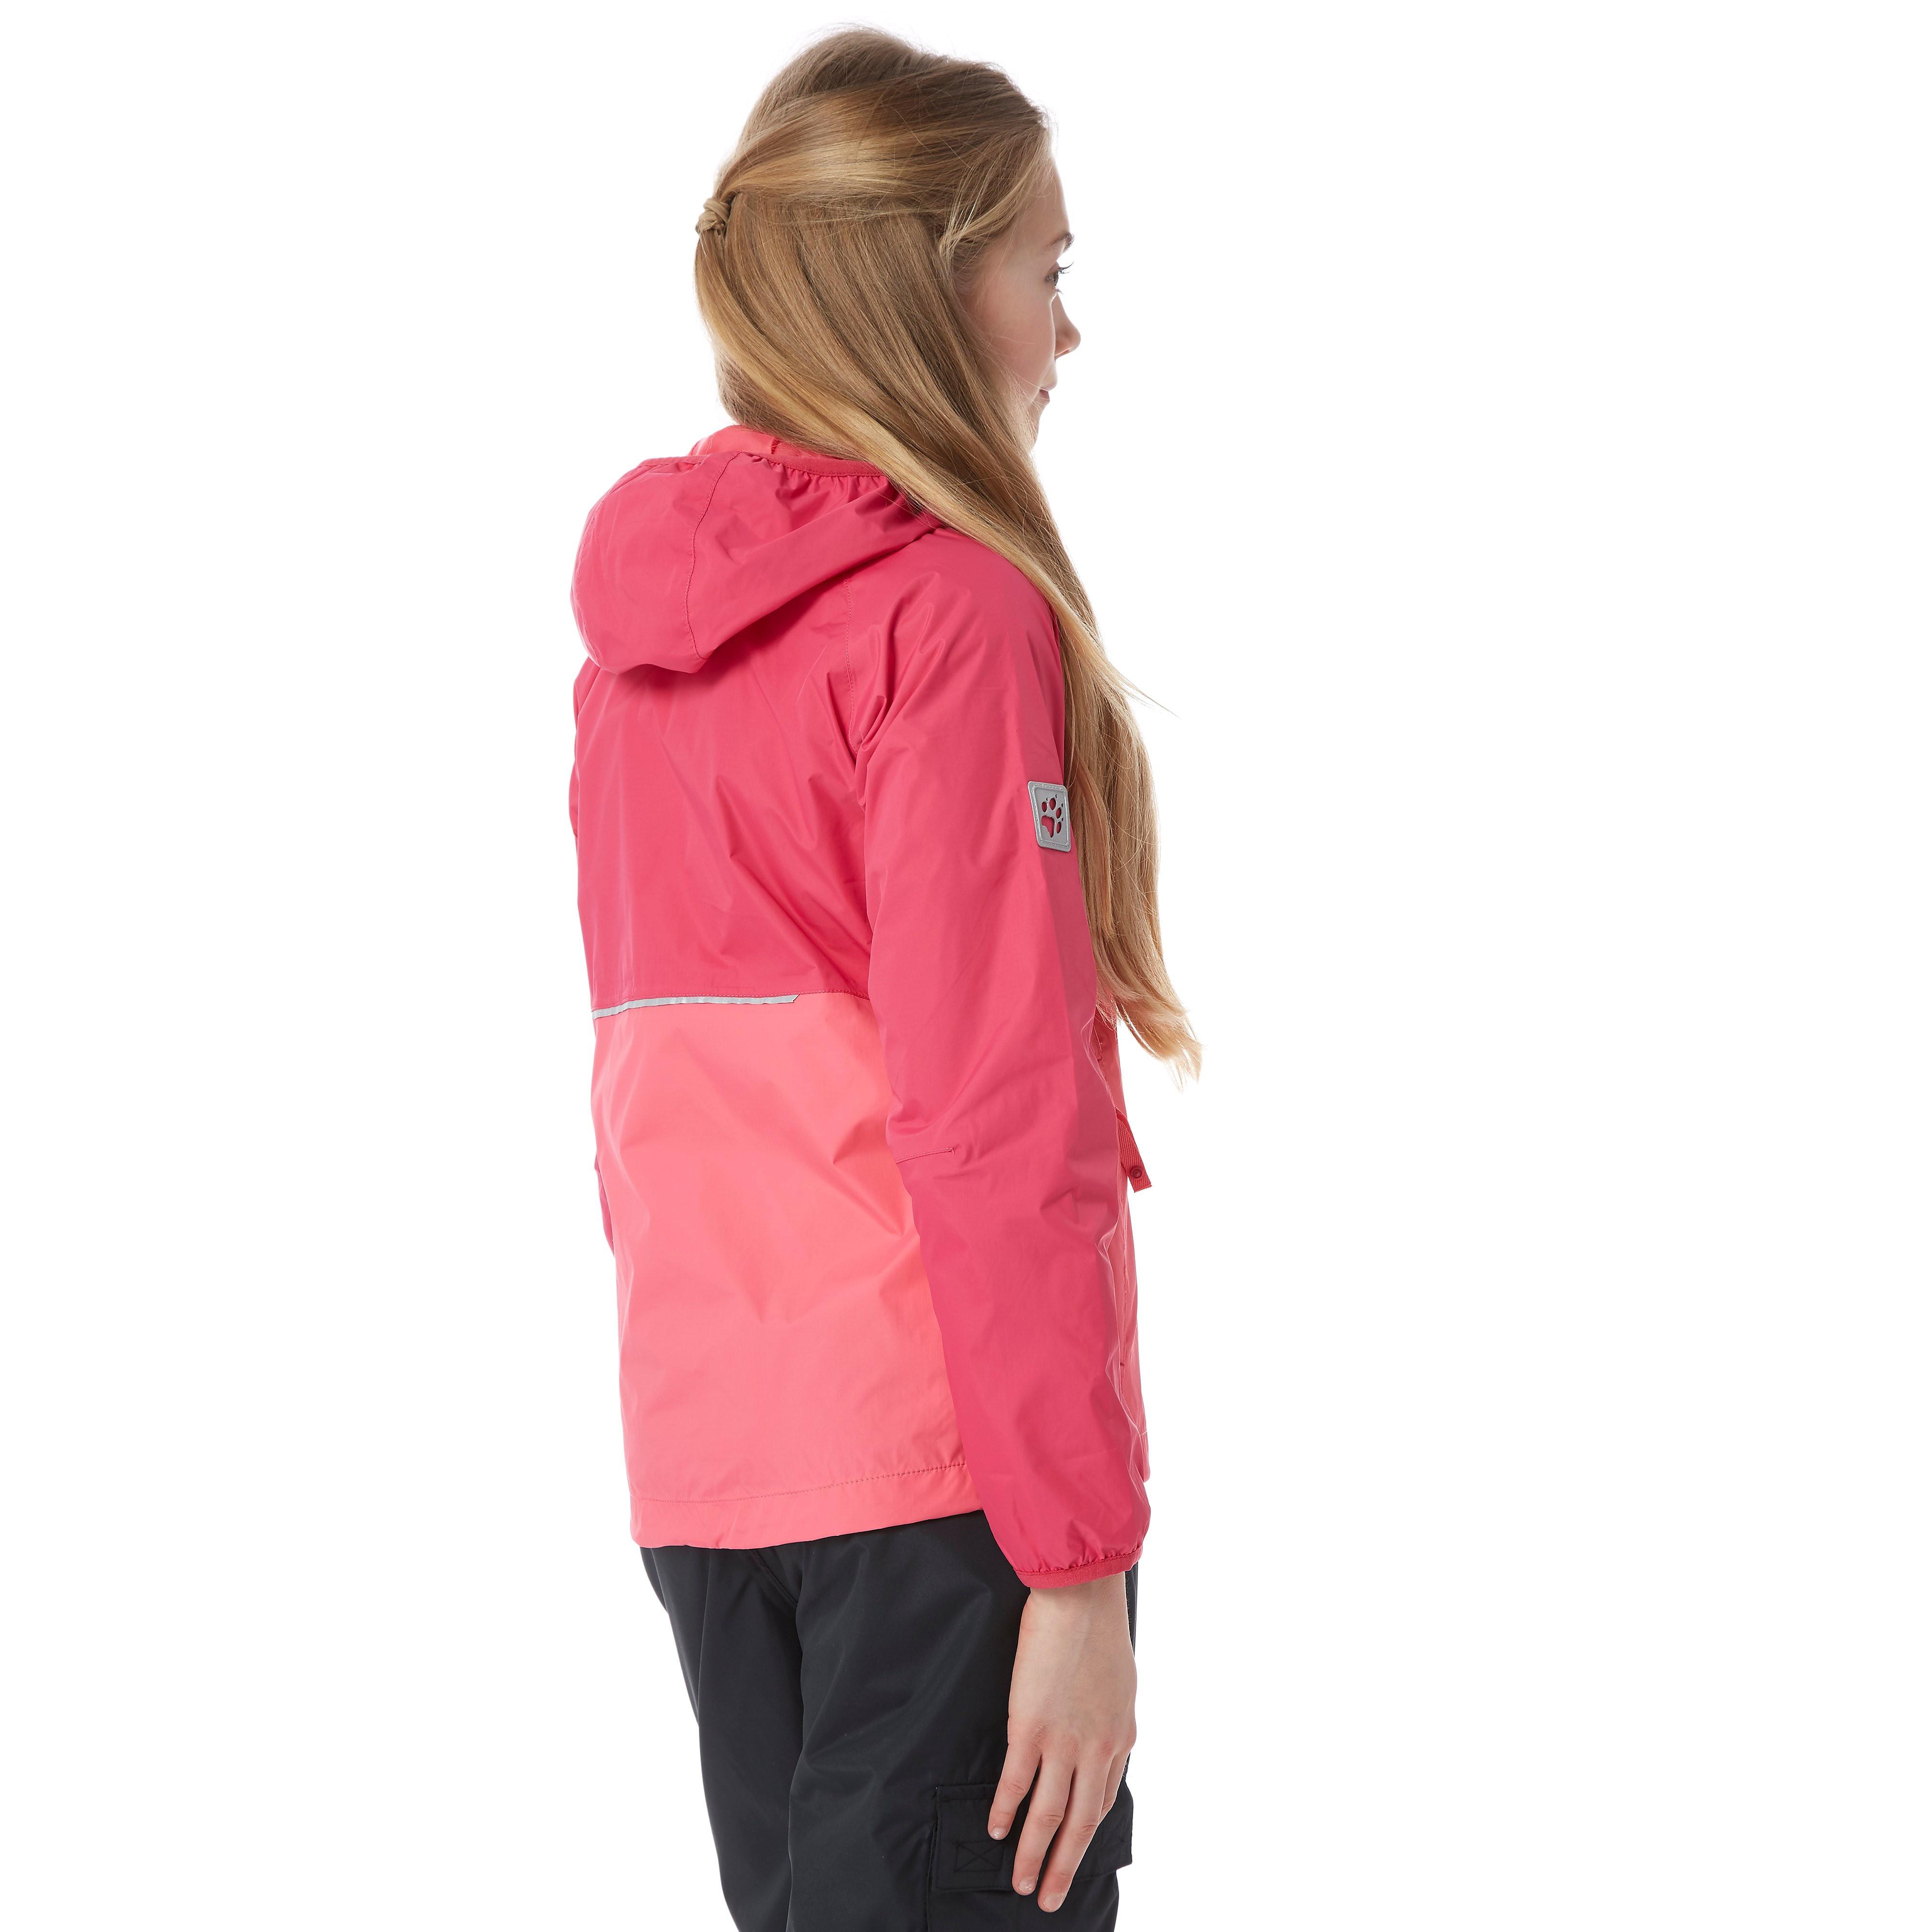 Jack Wolfskin Rainy Days Junior Jacket